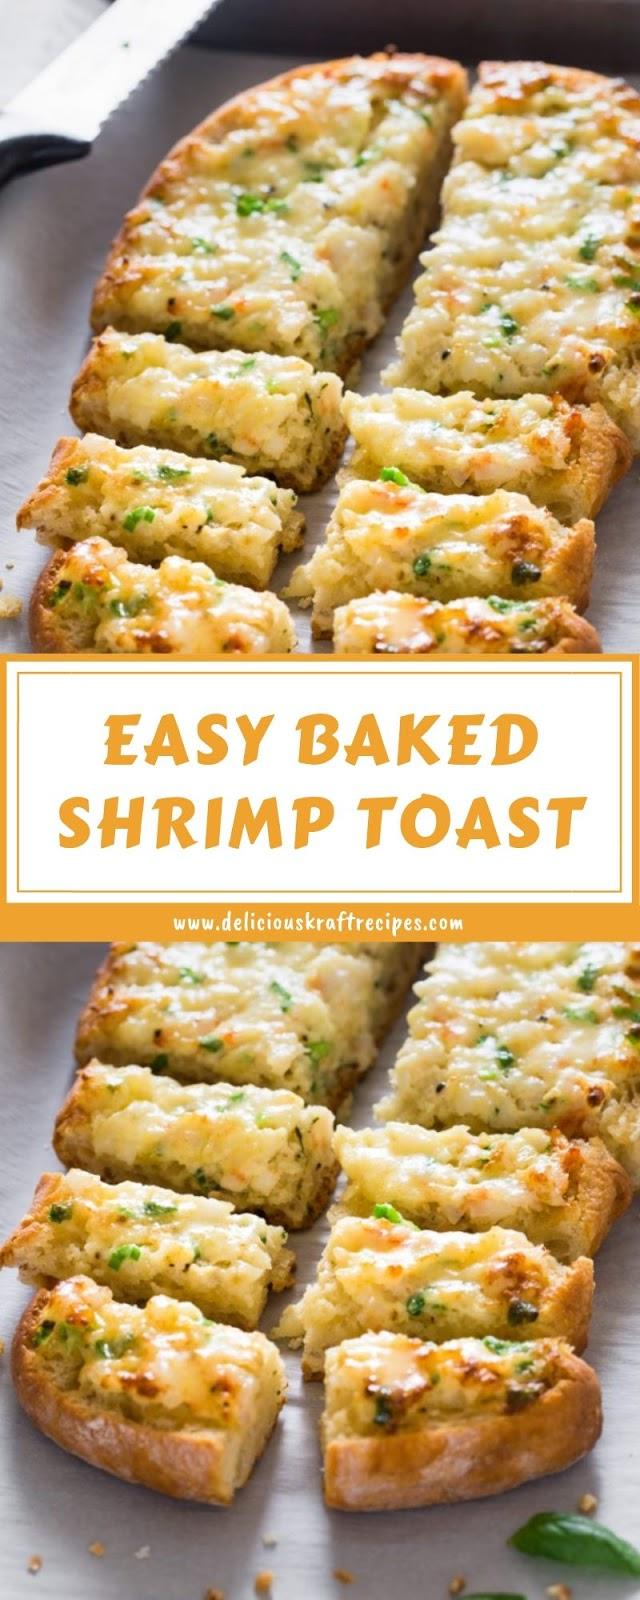 EASY BAKED SHRIMP TOAST